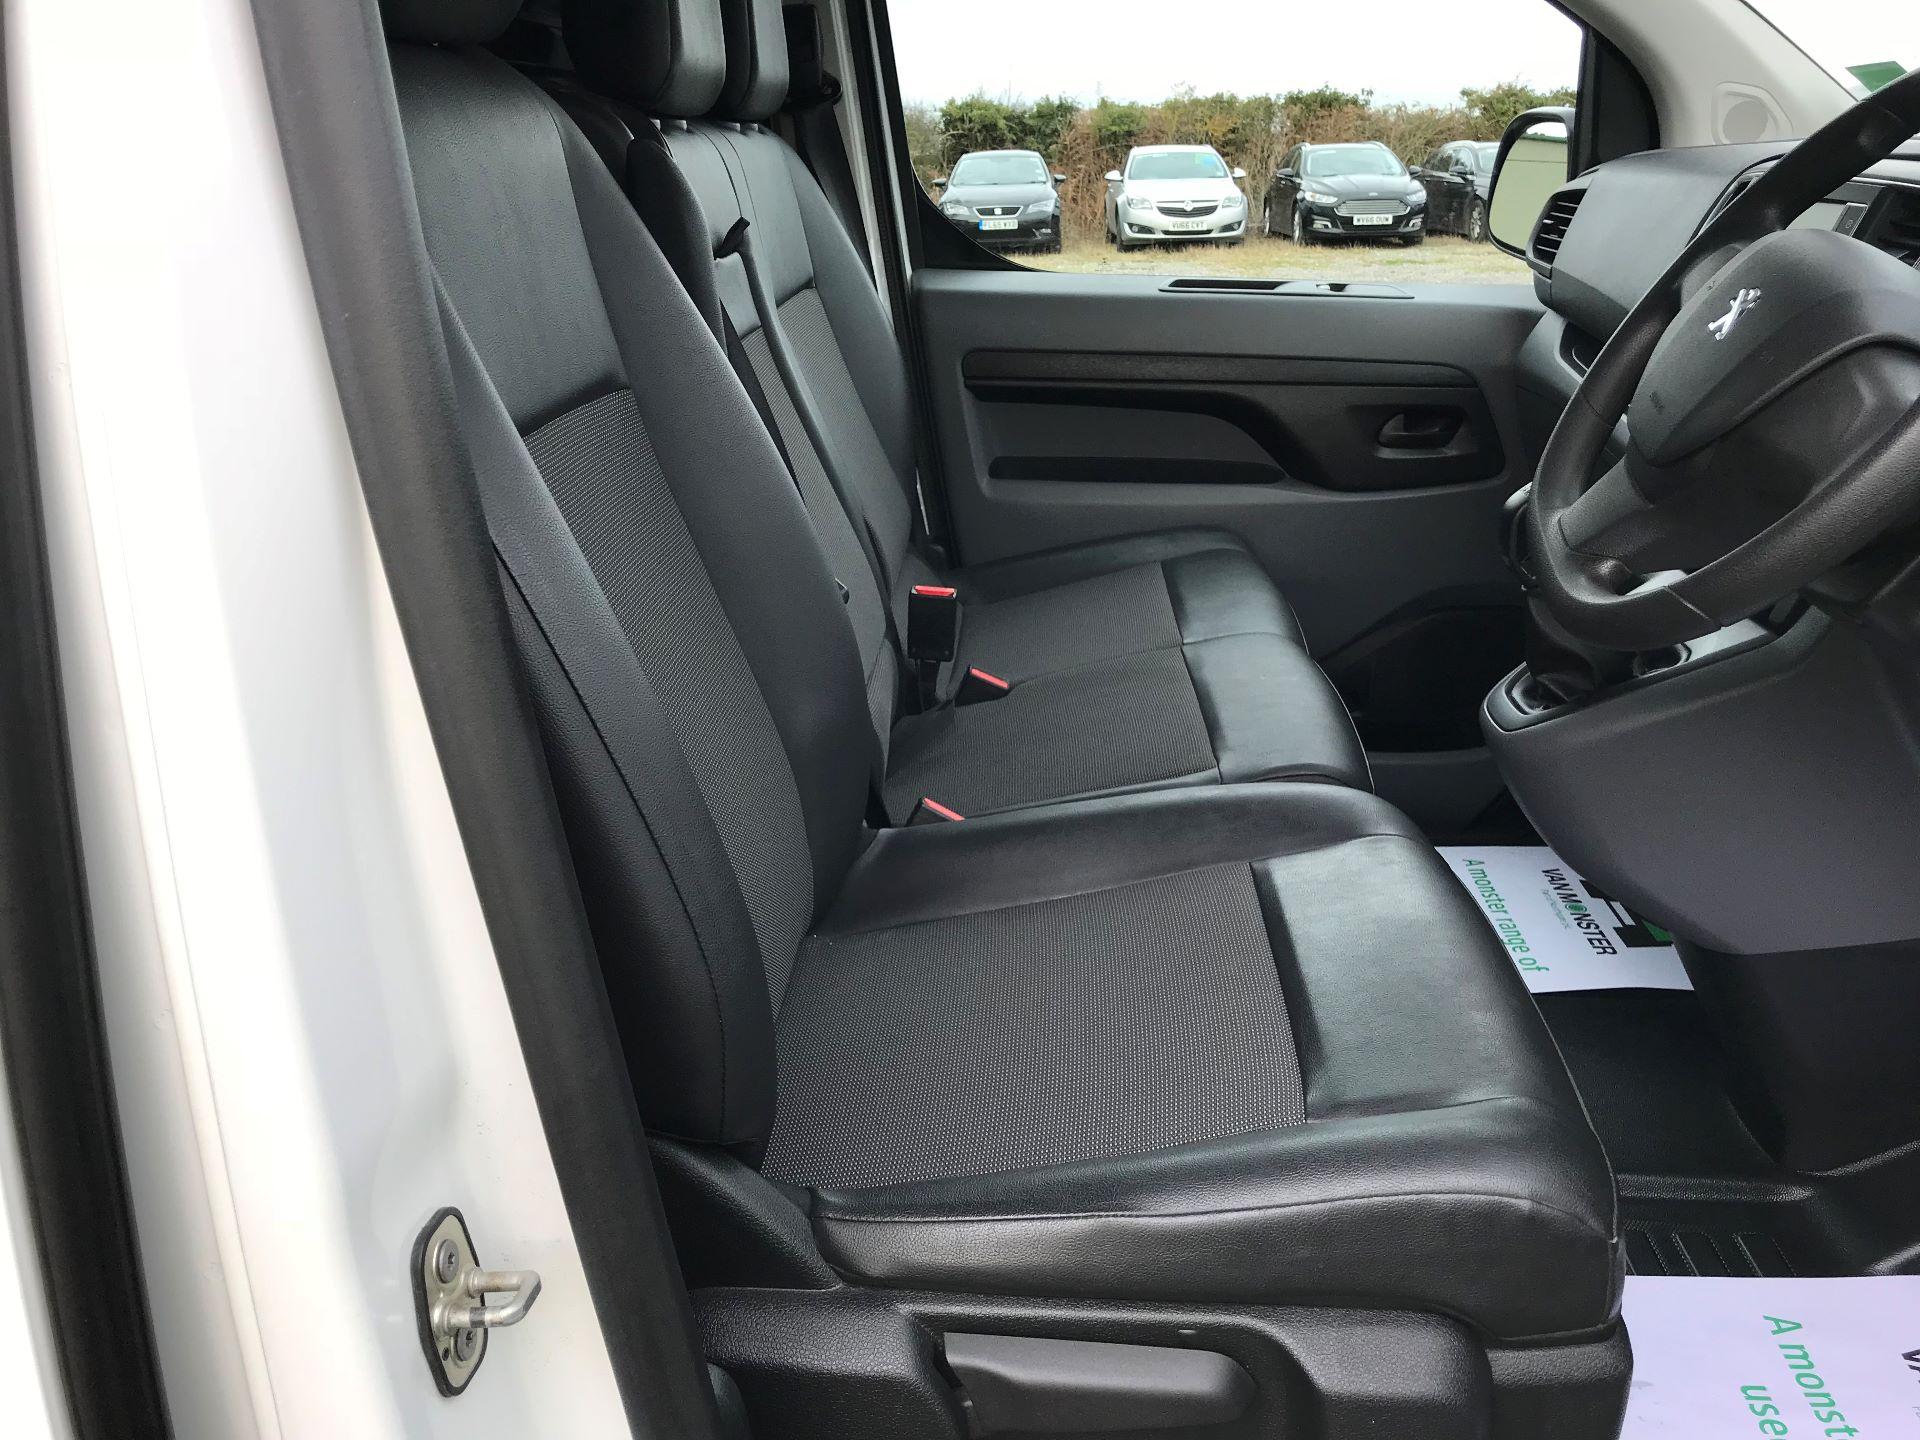 2018 Peugeot Expert STANDARD 1000 1.6 BLUEHDI 95 PROFESSIONAL EURO 6 (NU18VXL) Image 21